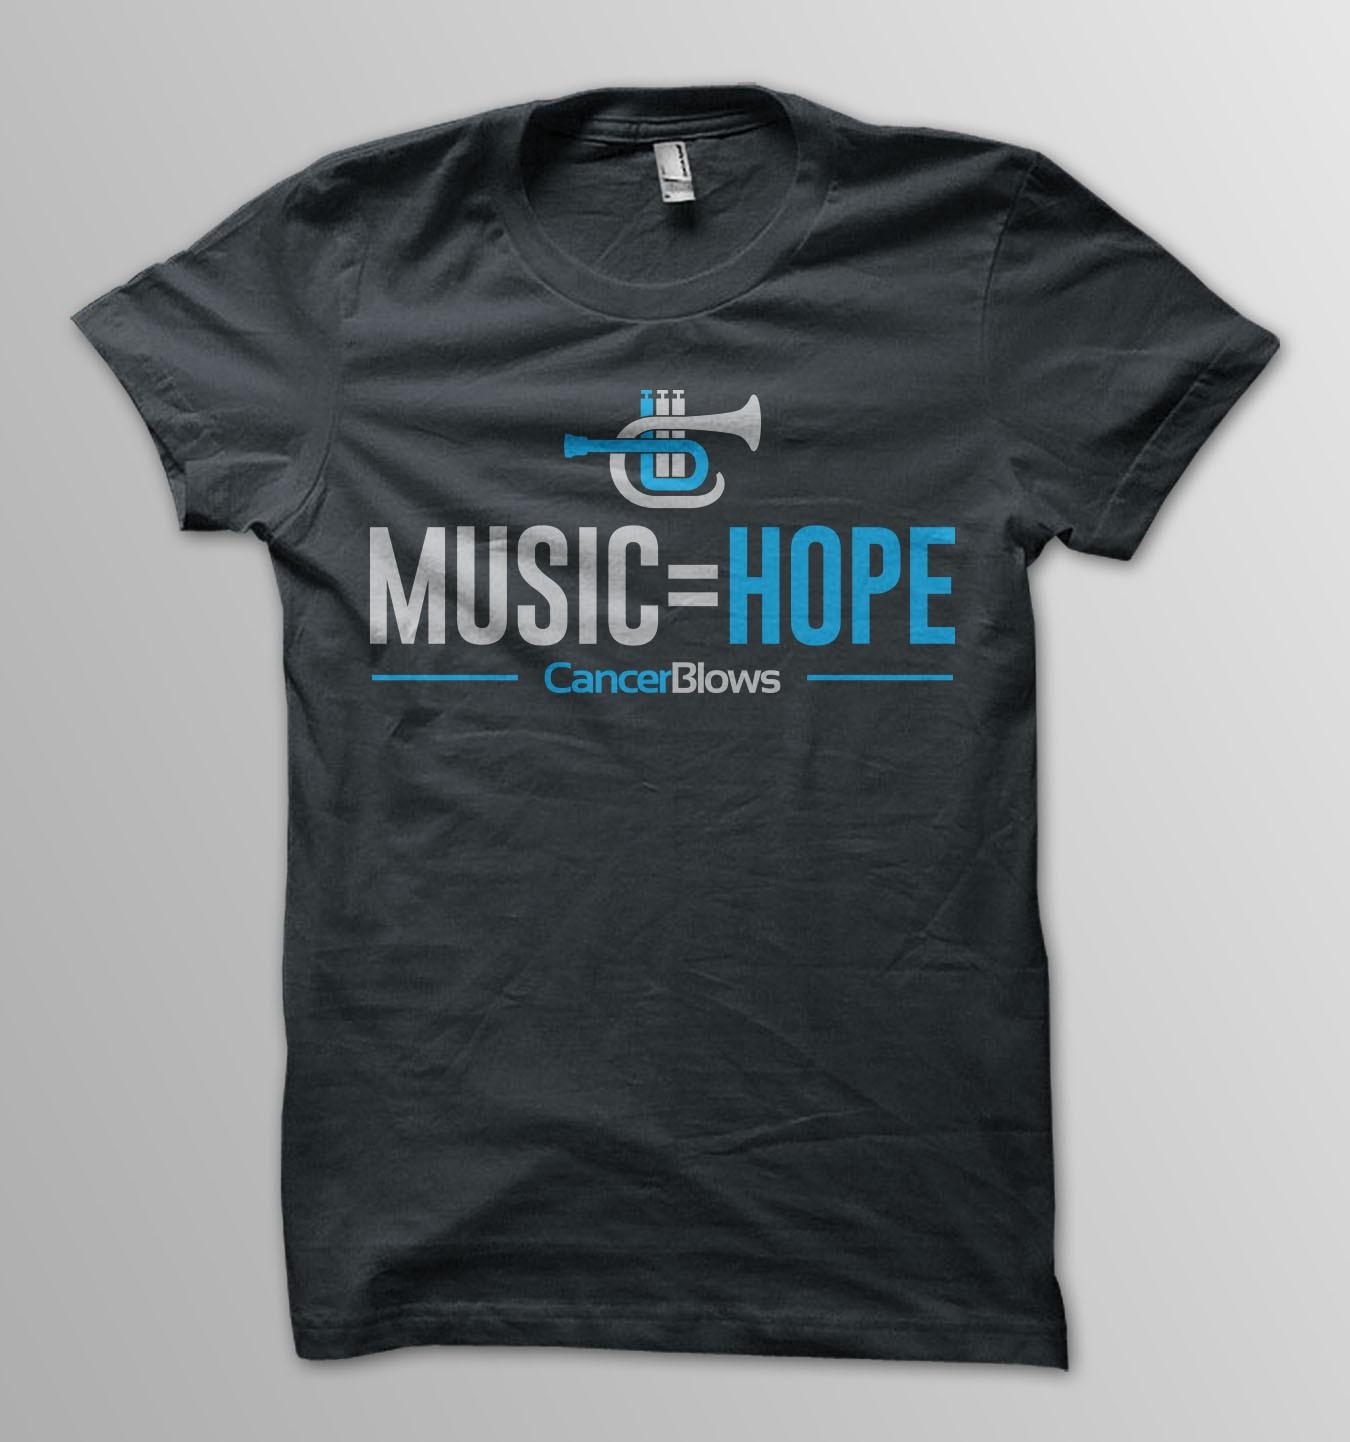 Design CancerBlows music=hope t-shirt!